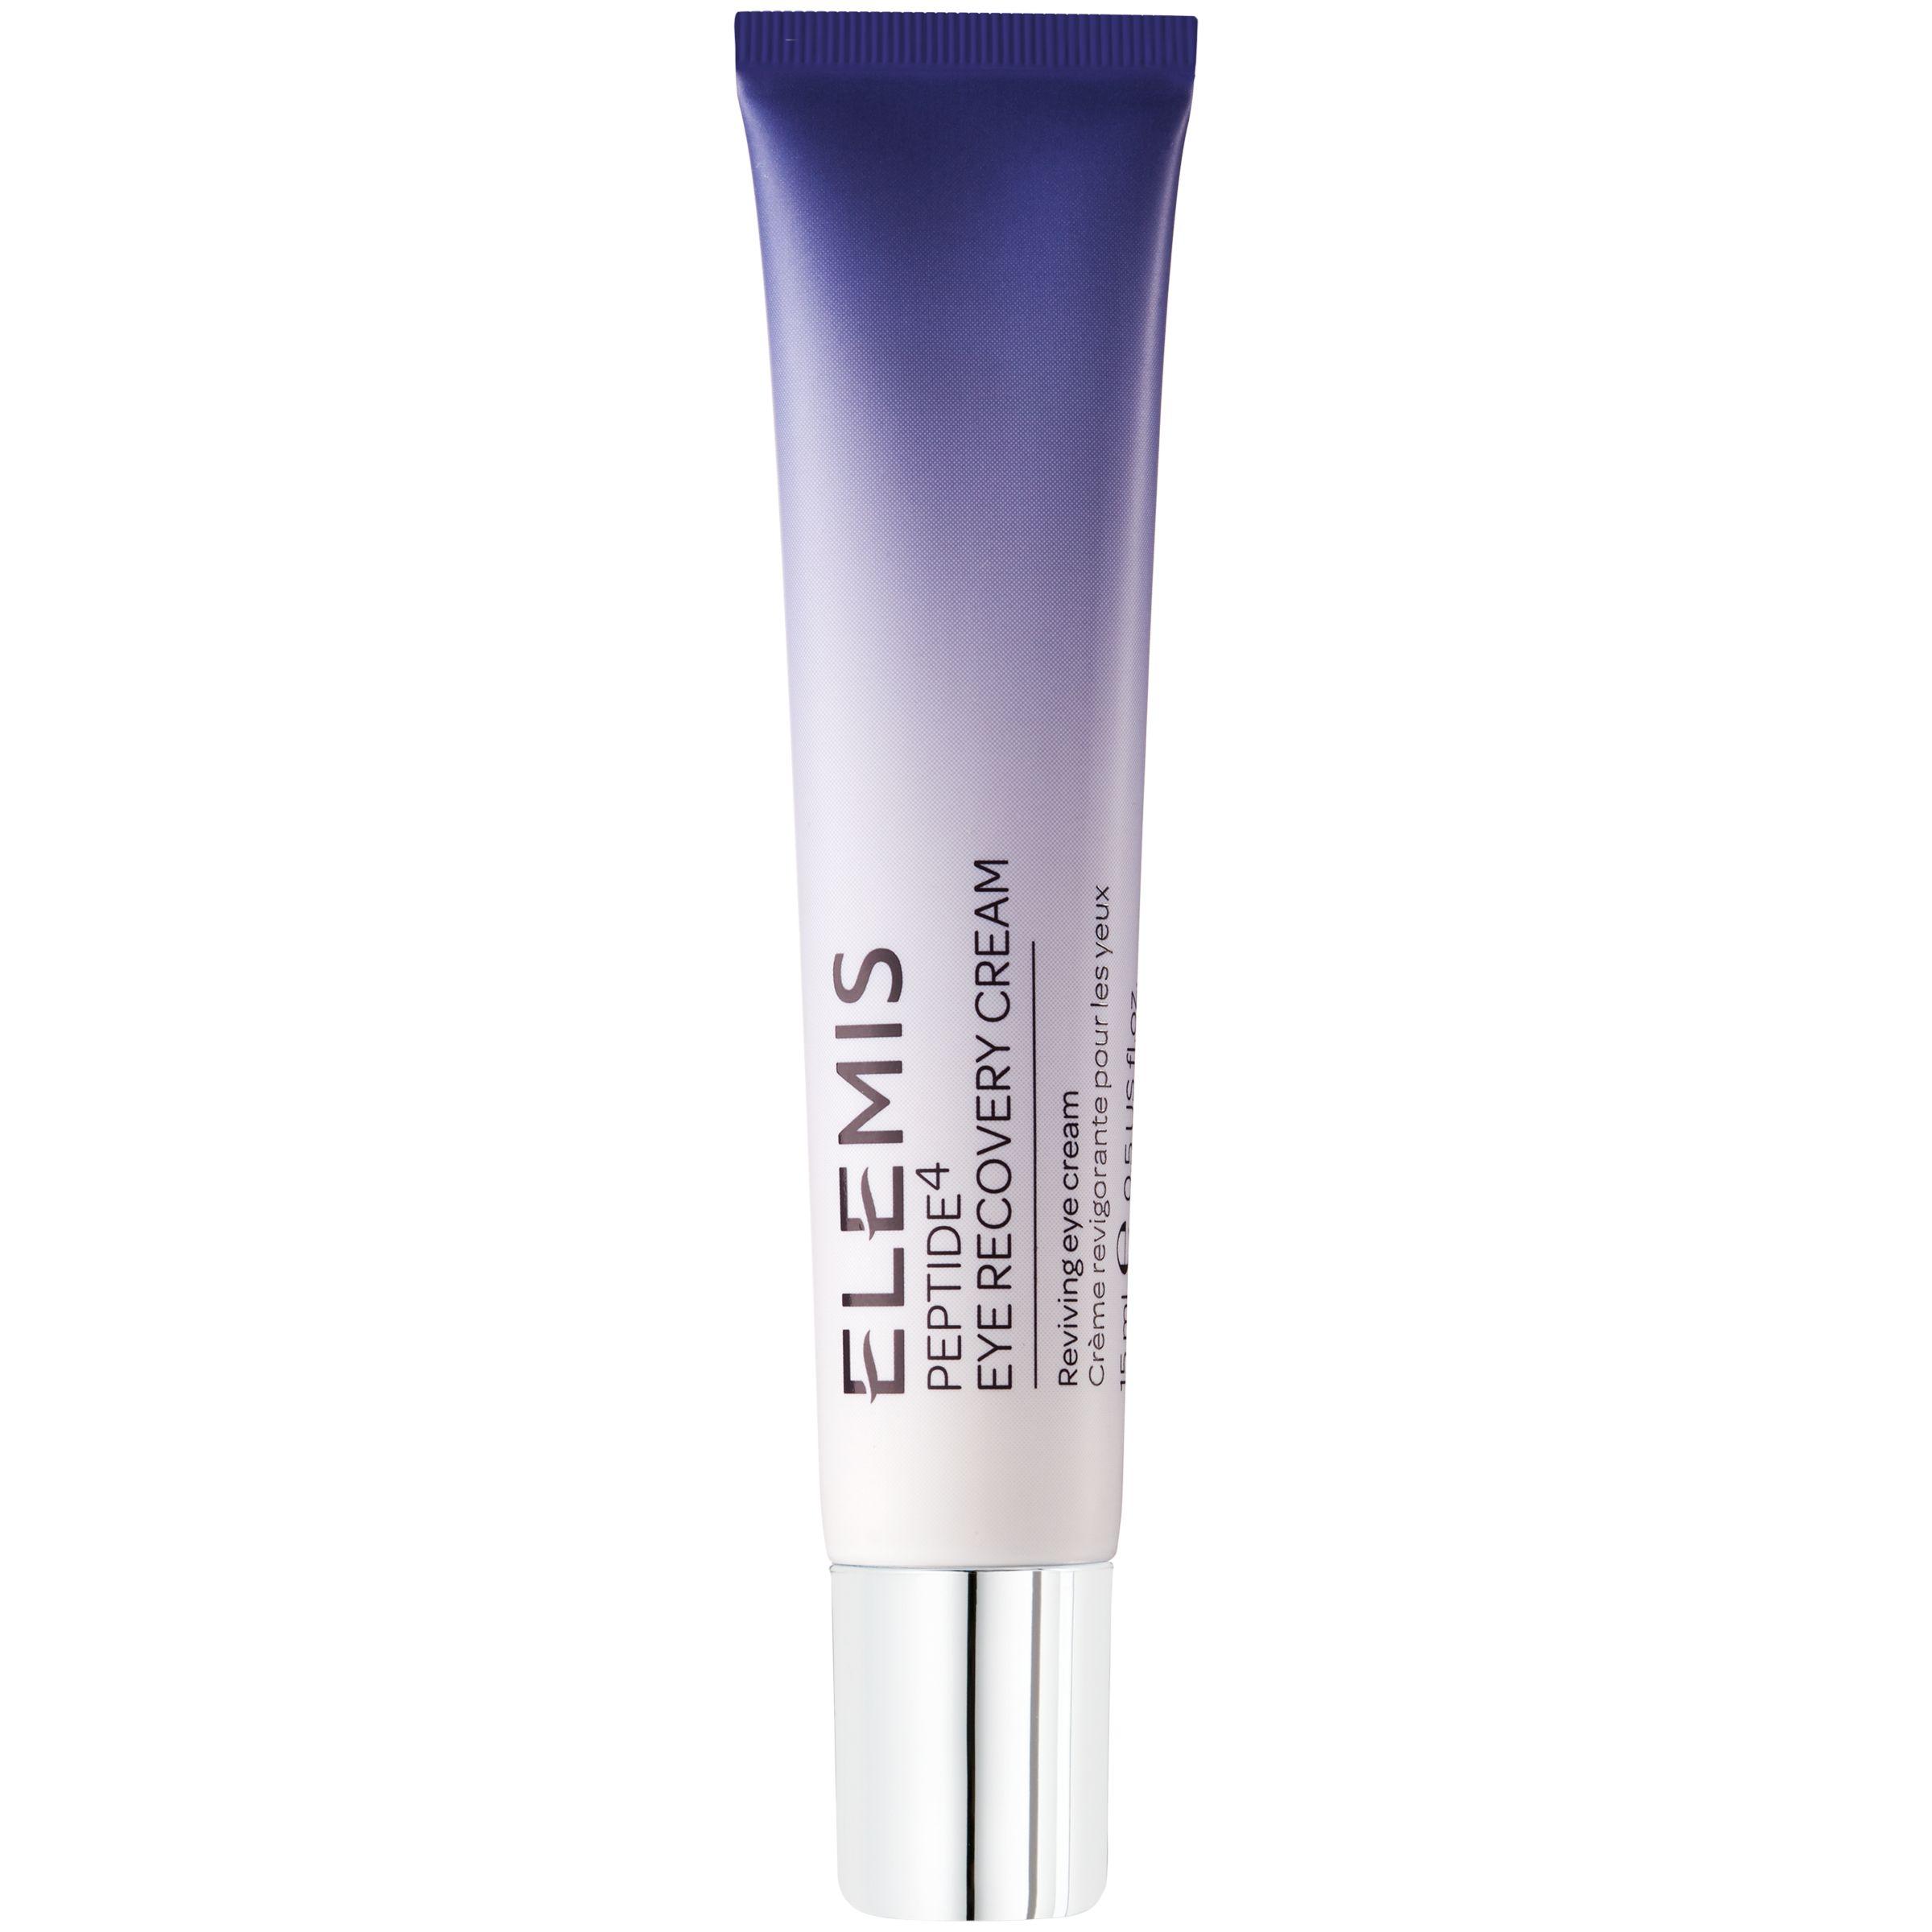 Elemis Elemis Peptide4 Eye Recovery Cream, 15ml